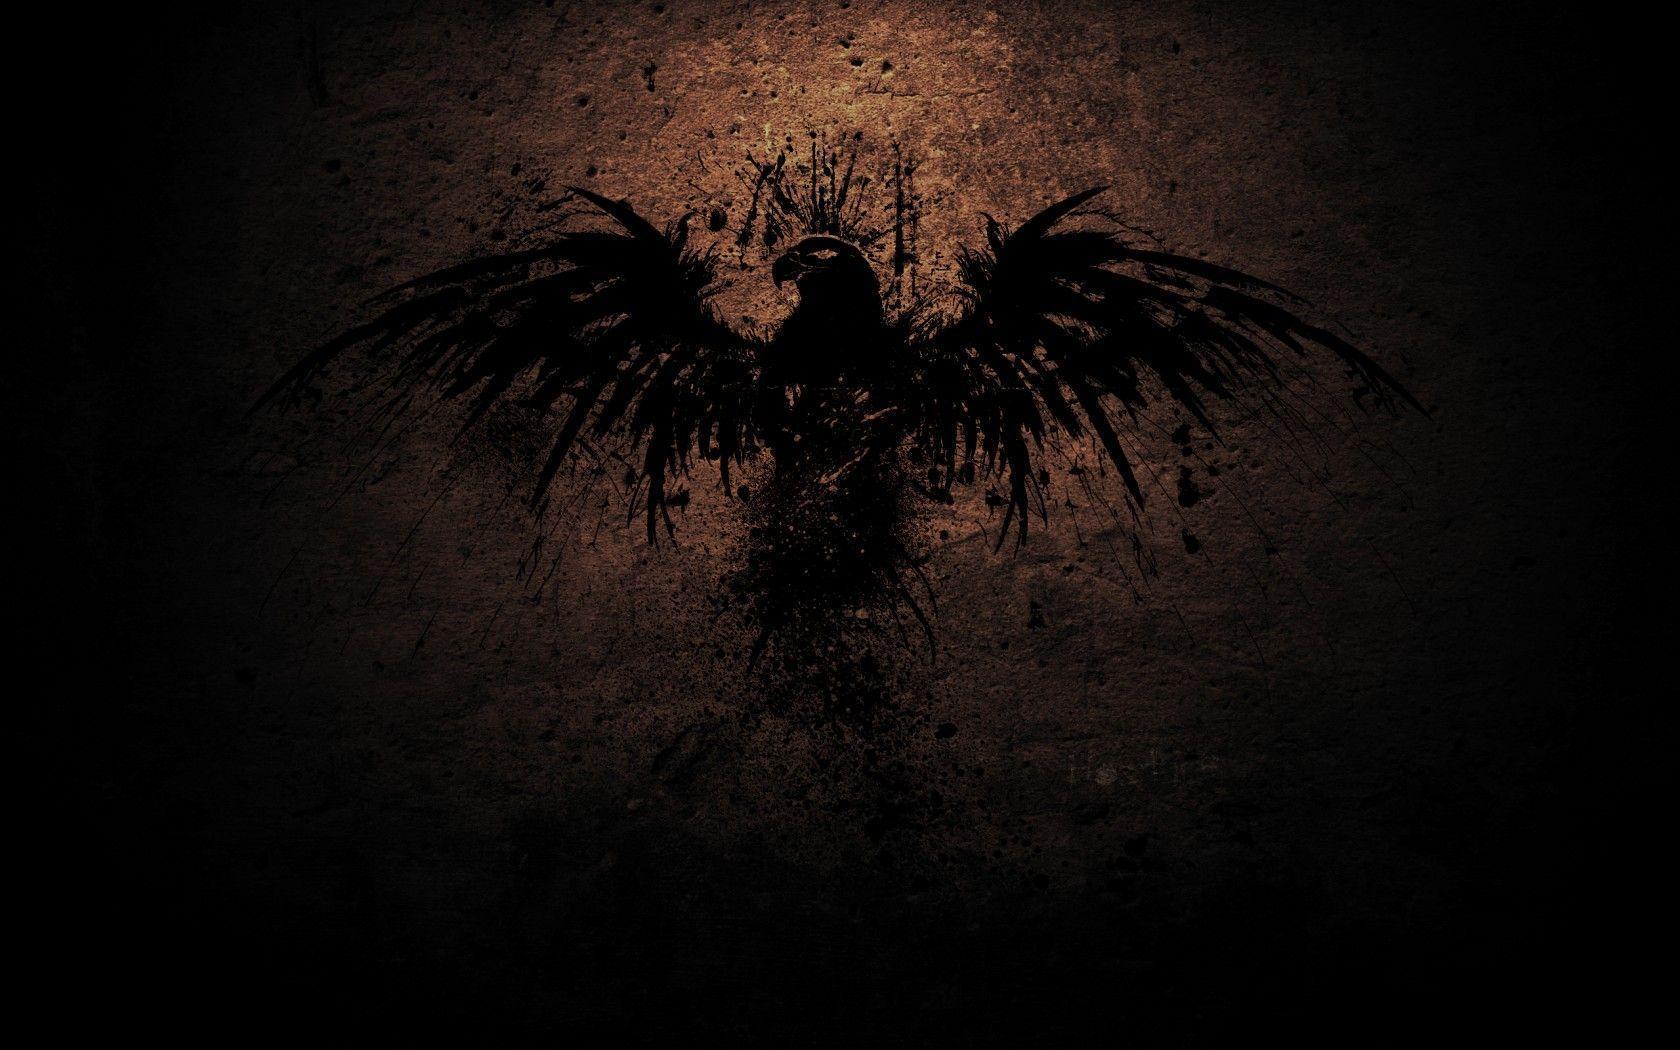 dark wallpapers - wallpaper cave